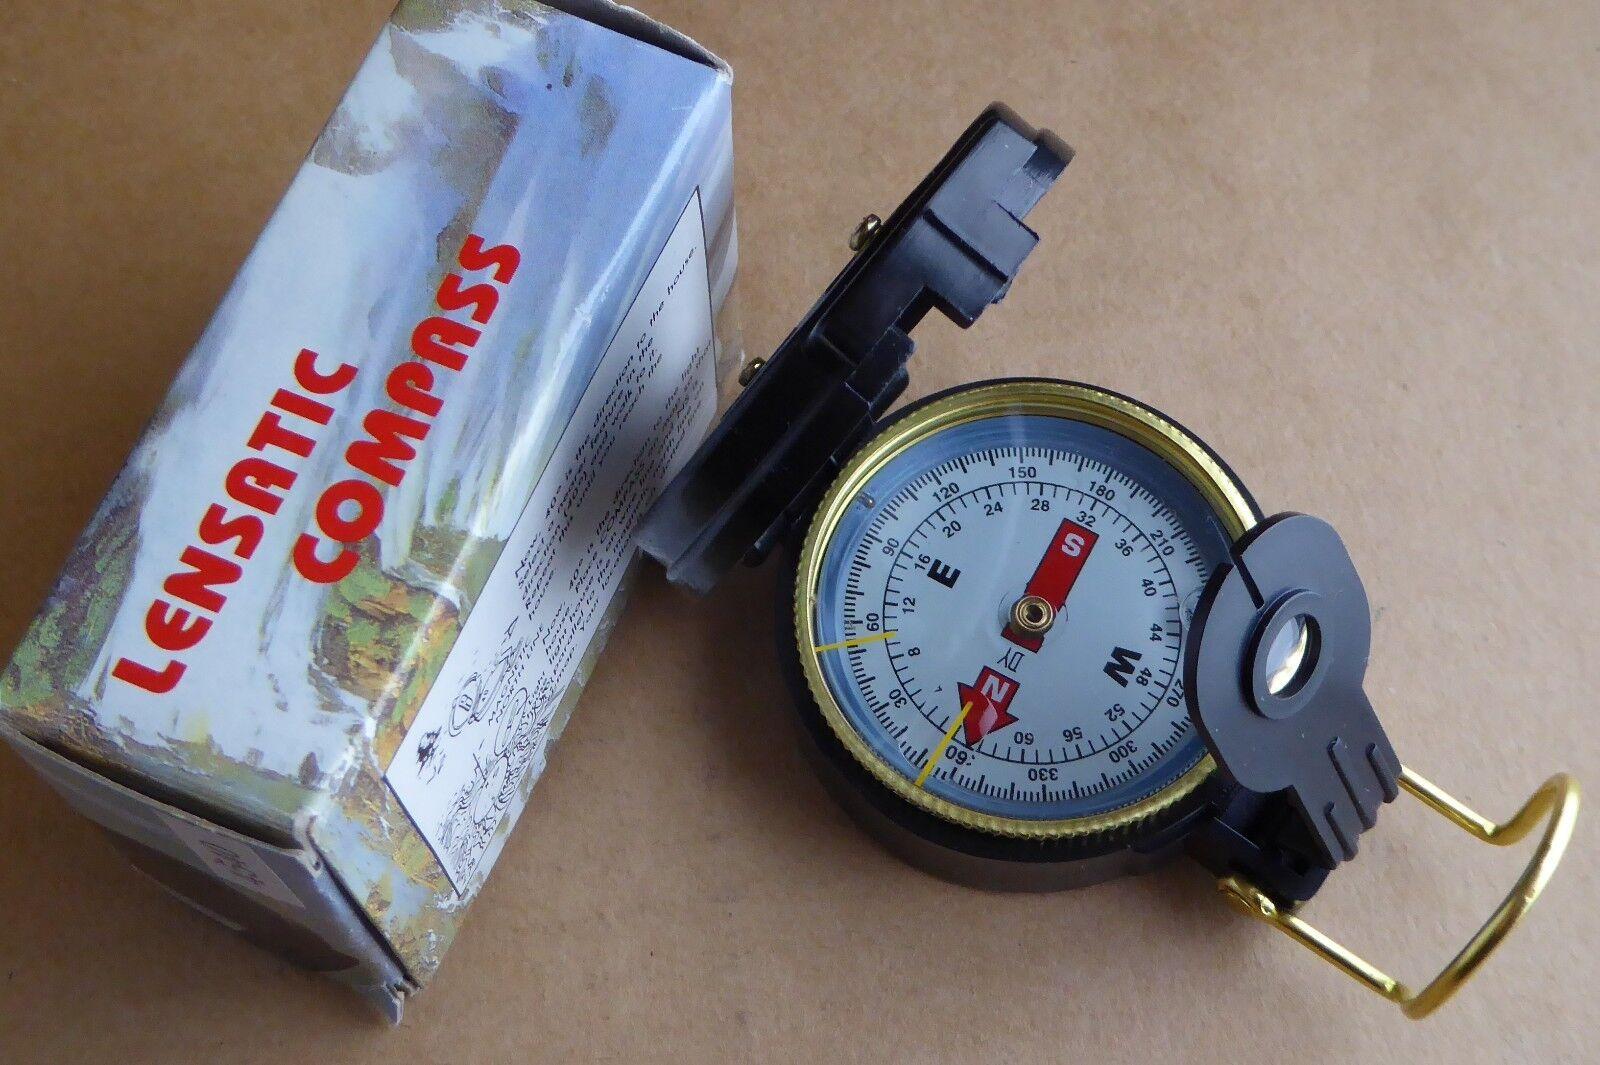 Engineer Engineer Engineer Directional Compass avec boite, excellent état, Lensatic. 1e7dbc